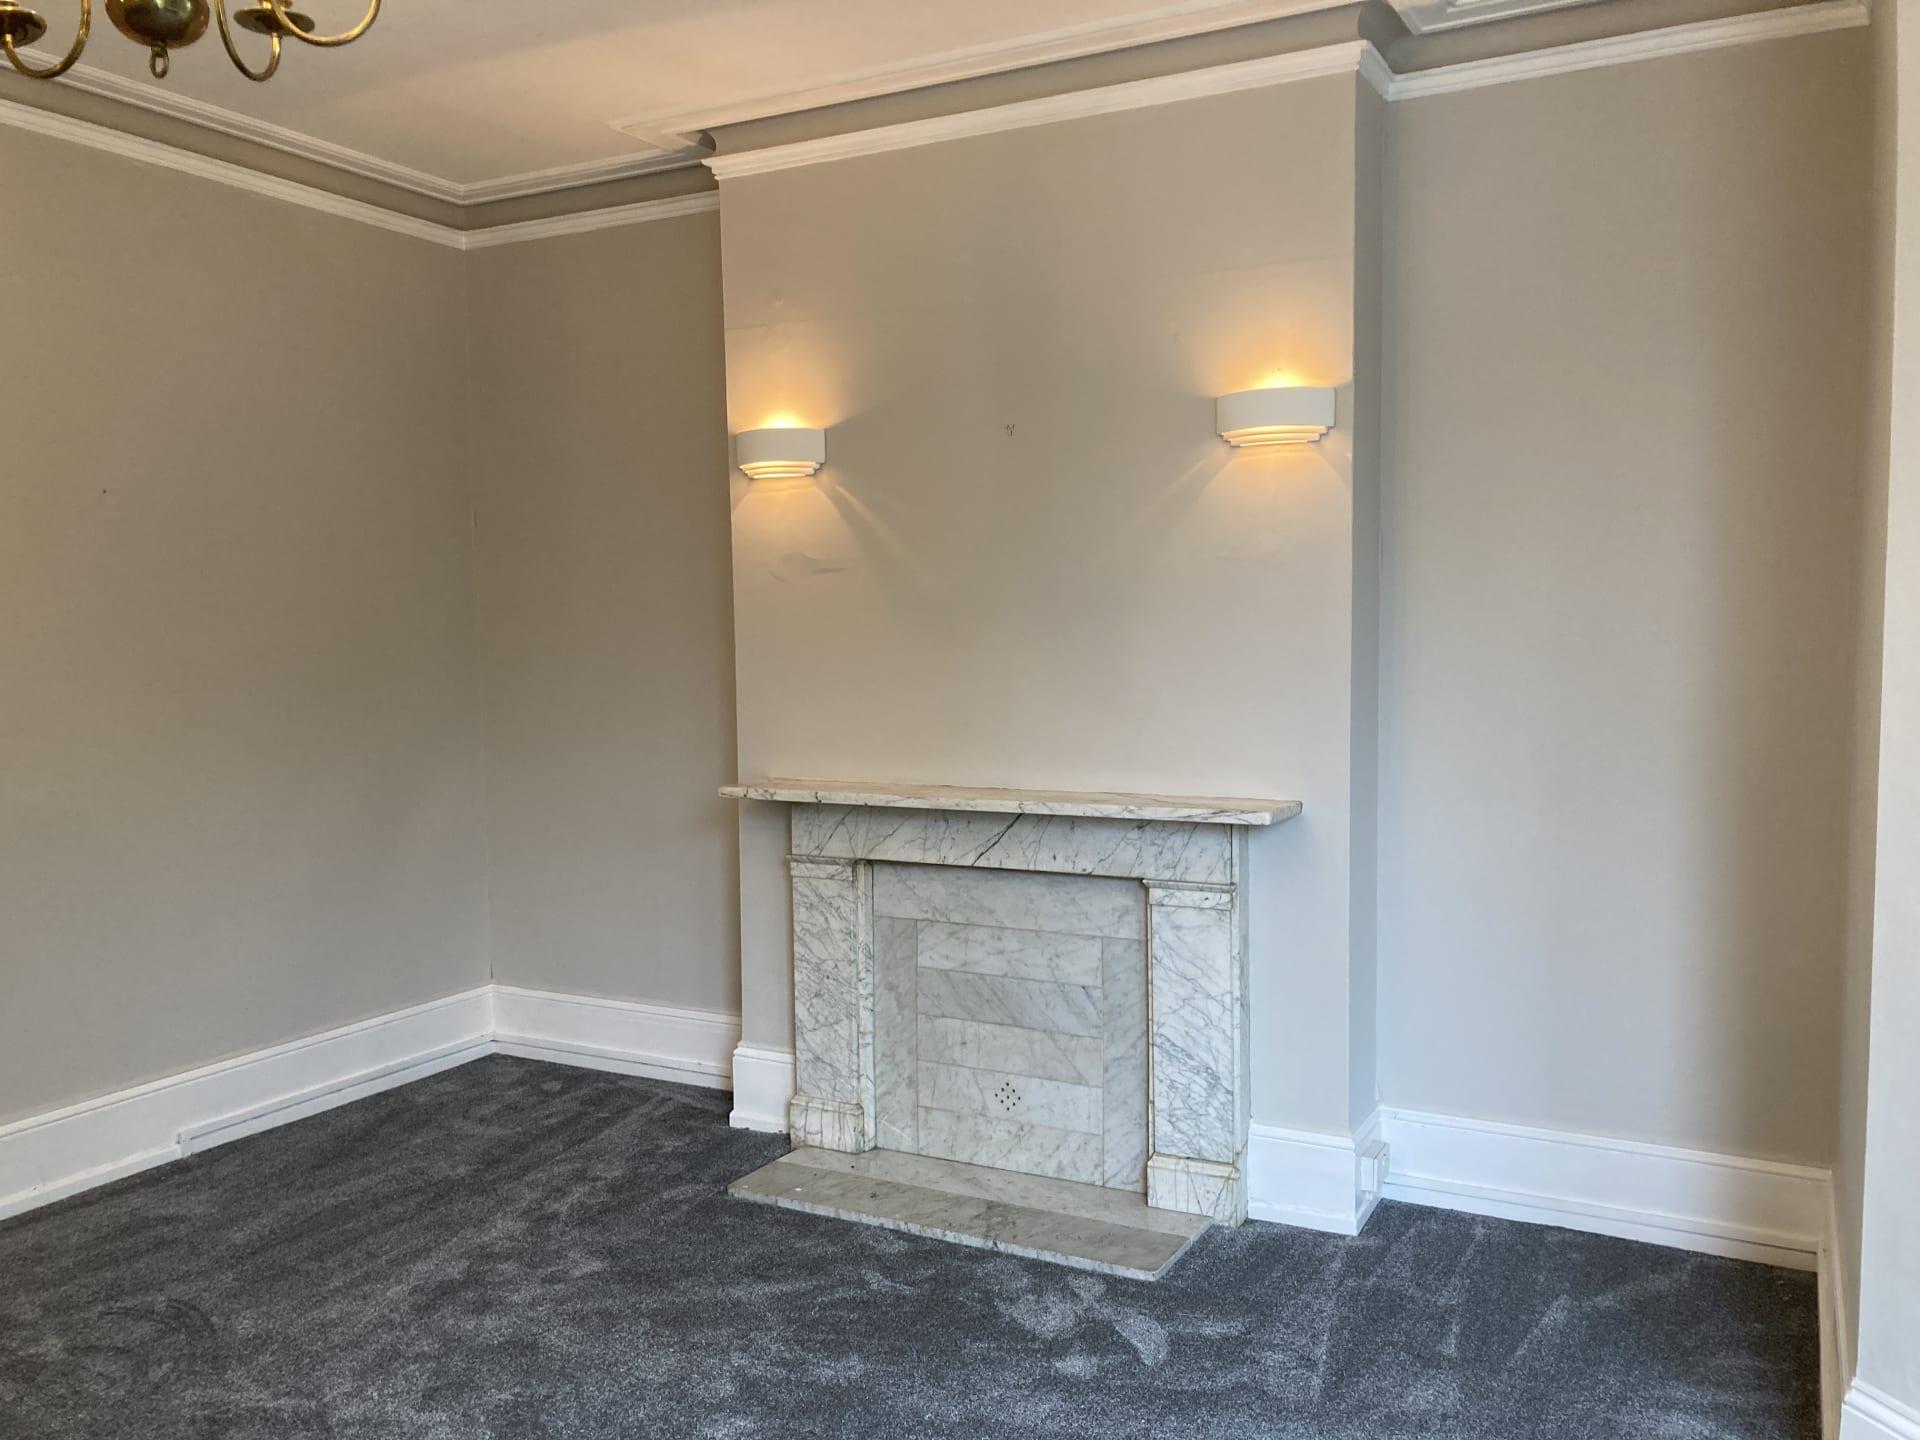 Suite 5, 40 Wilbury Road Hove image.